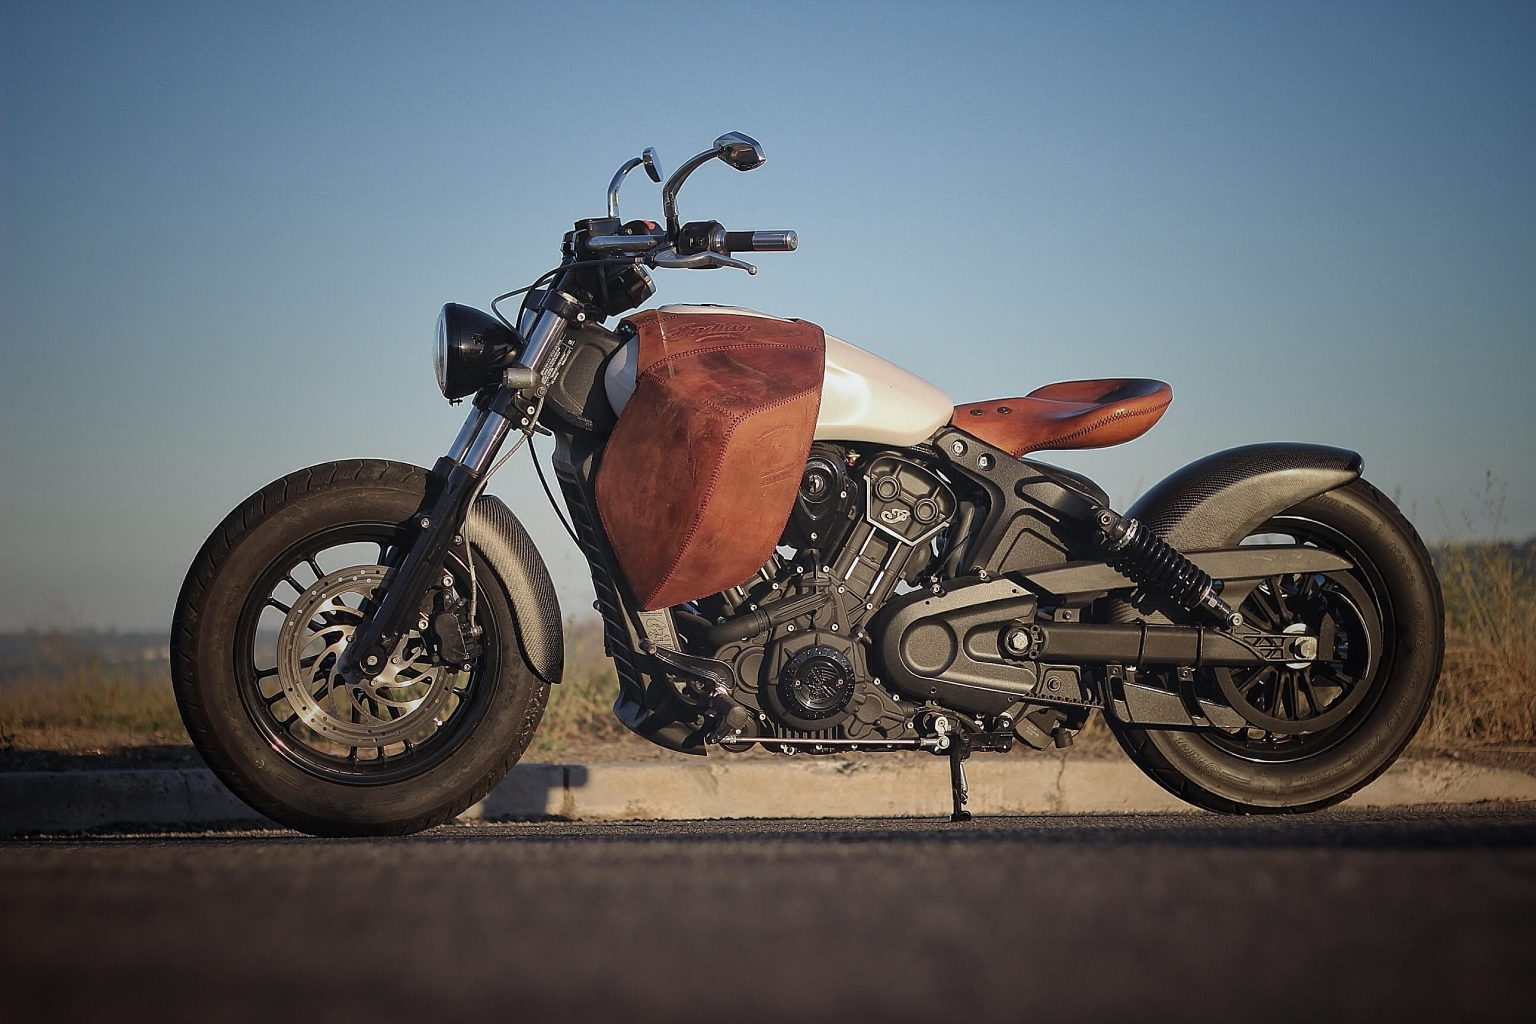 Custom motorcycle leather designs